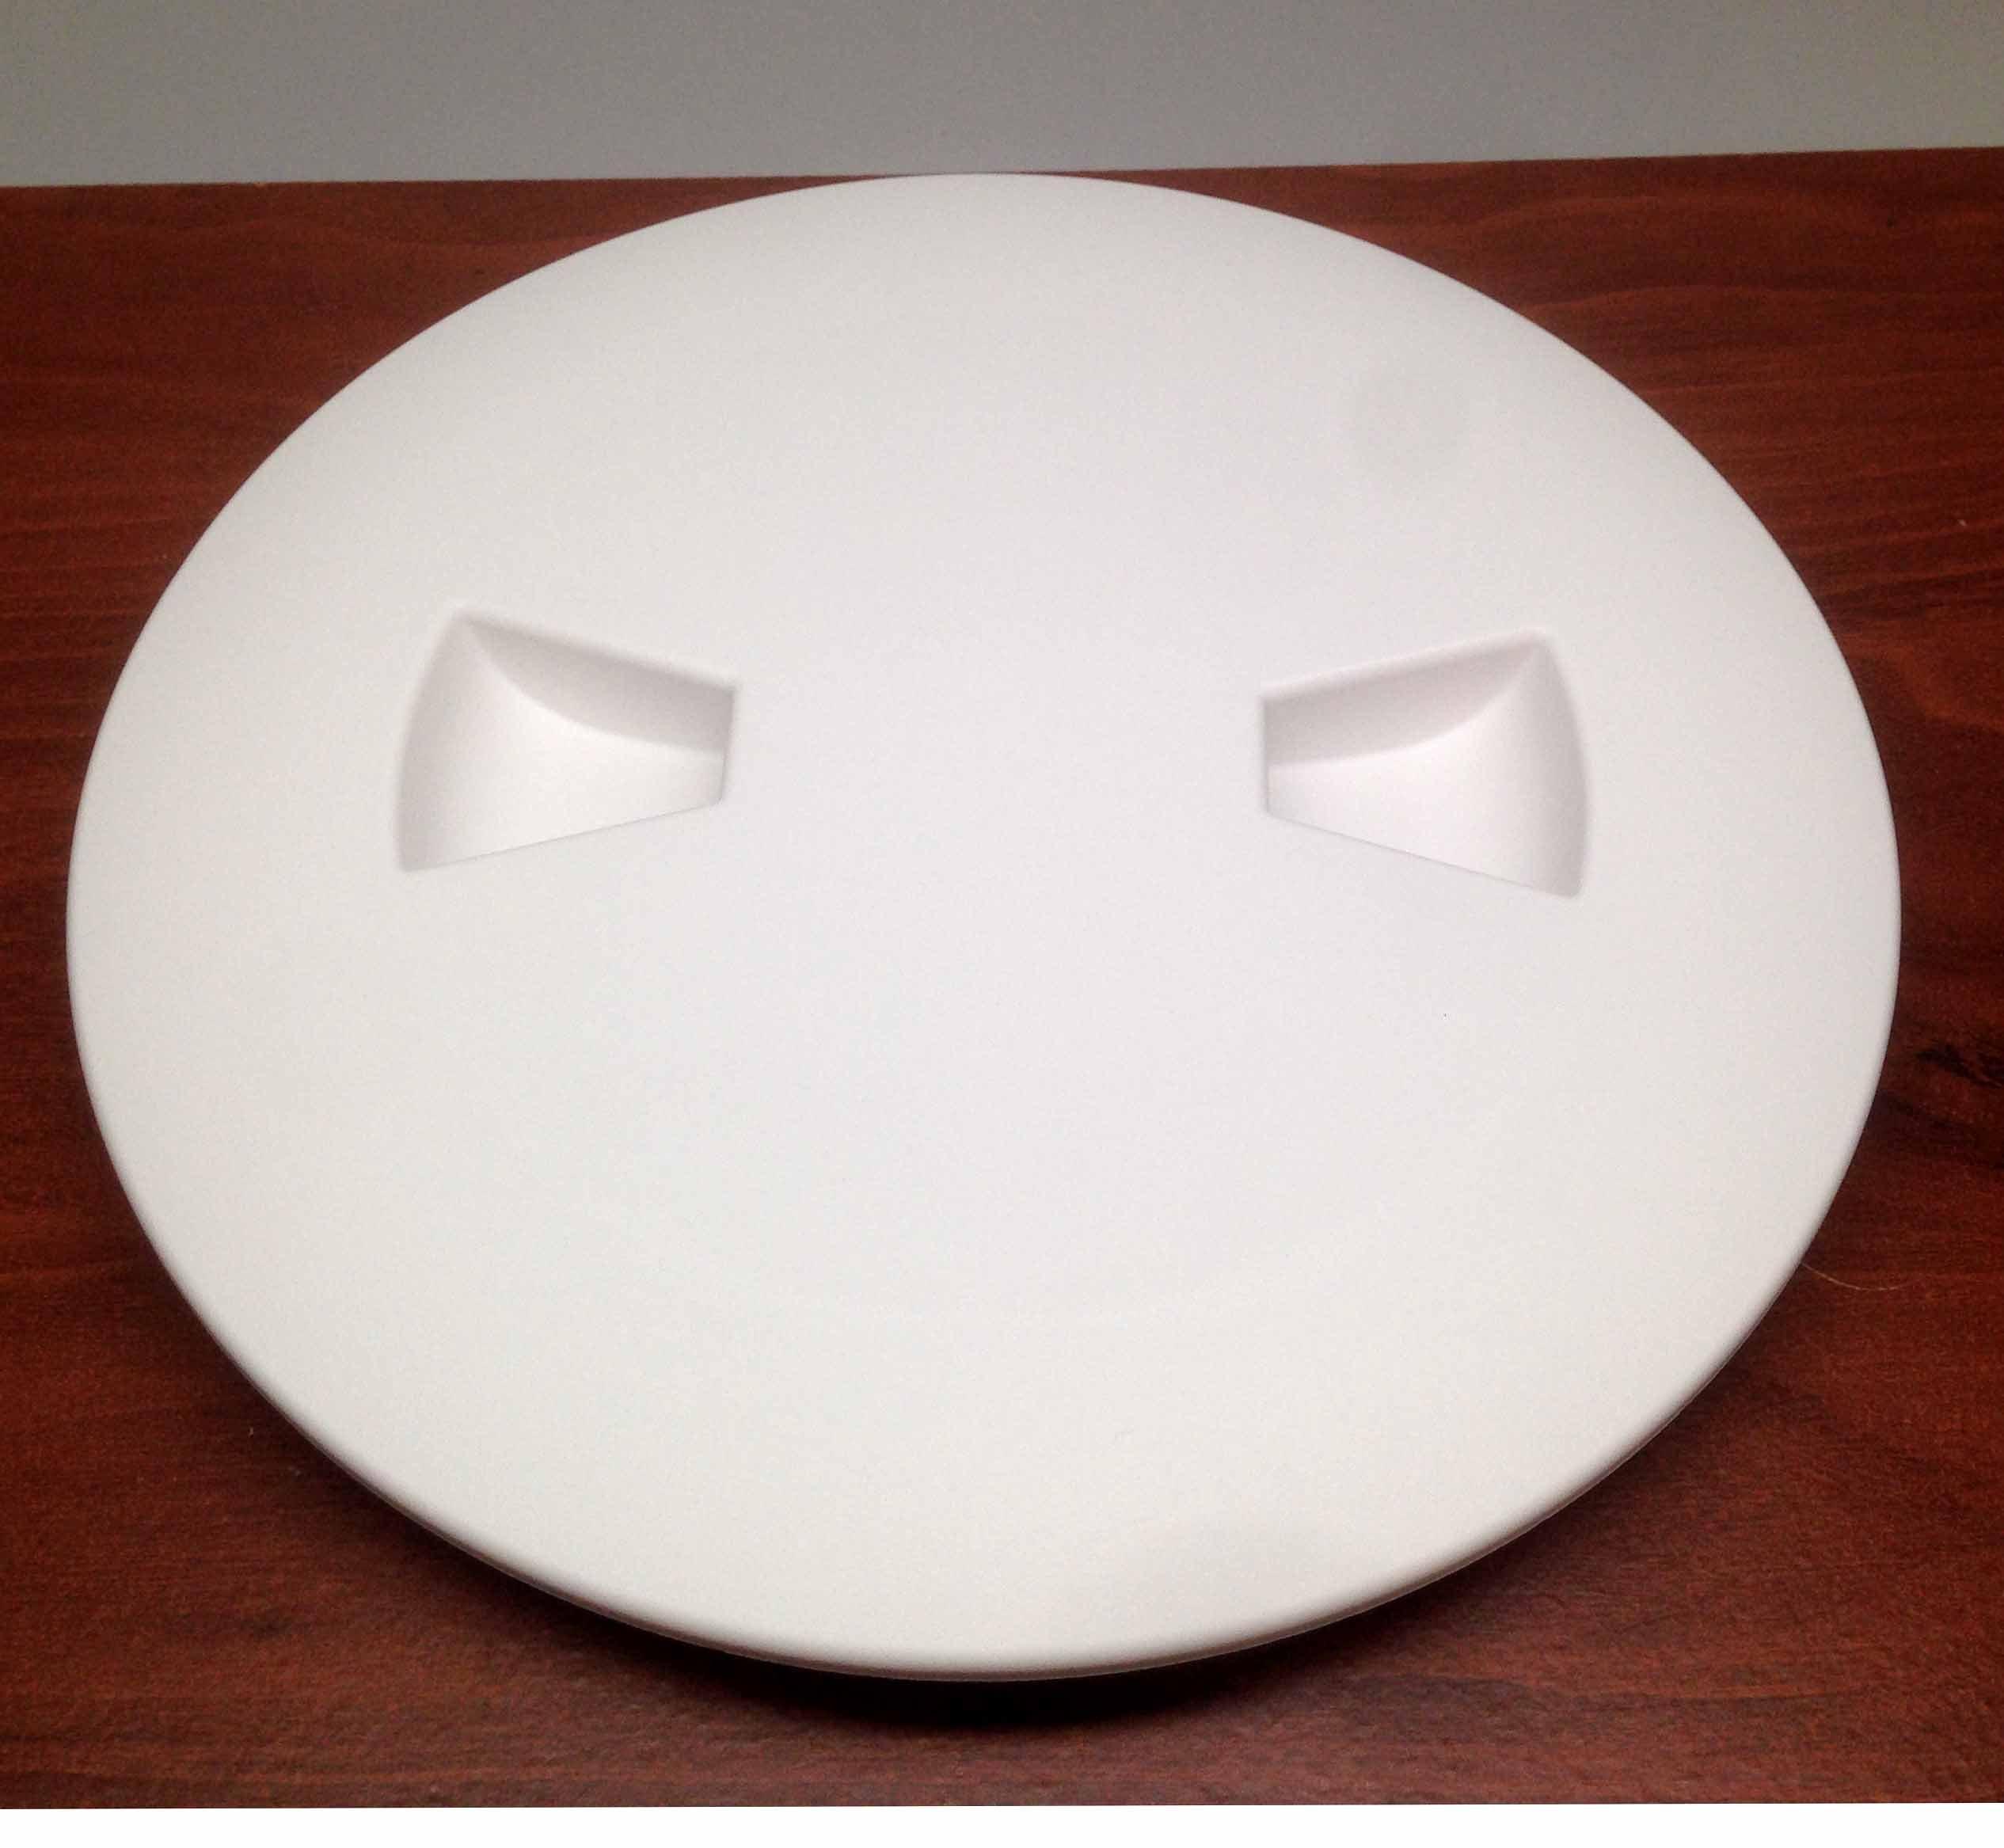 MARINE BOAT WHITE PLASTIC DECK PLATE 4''D WATERPROOF INSPECTION BAYONET TYPE